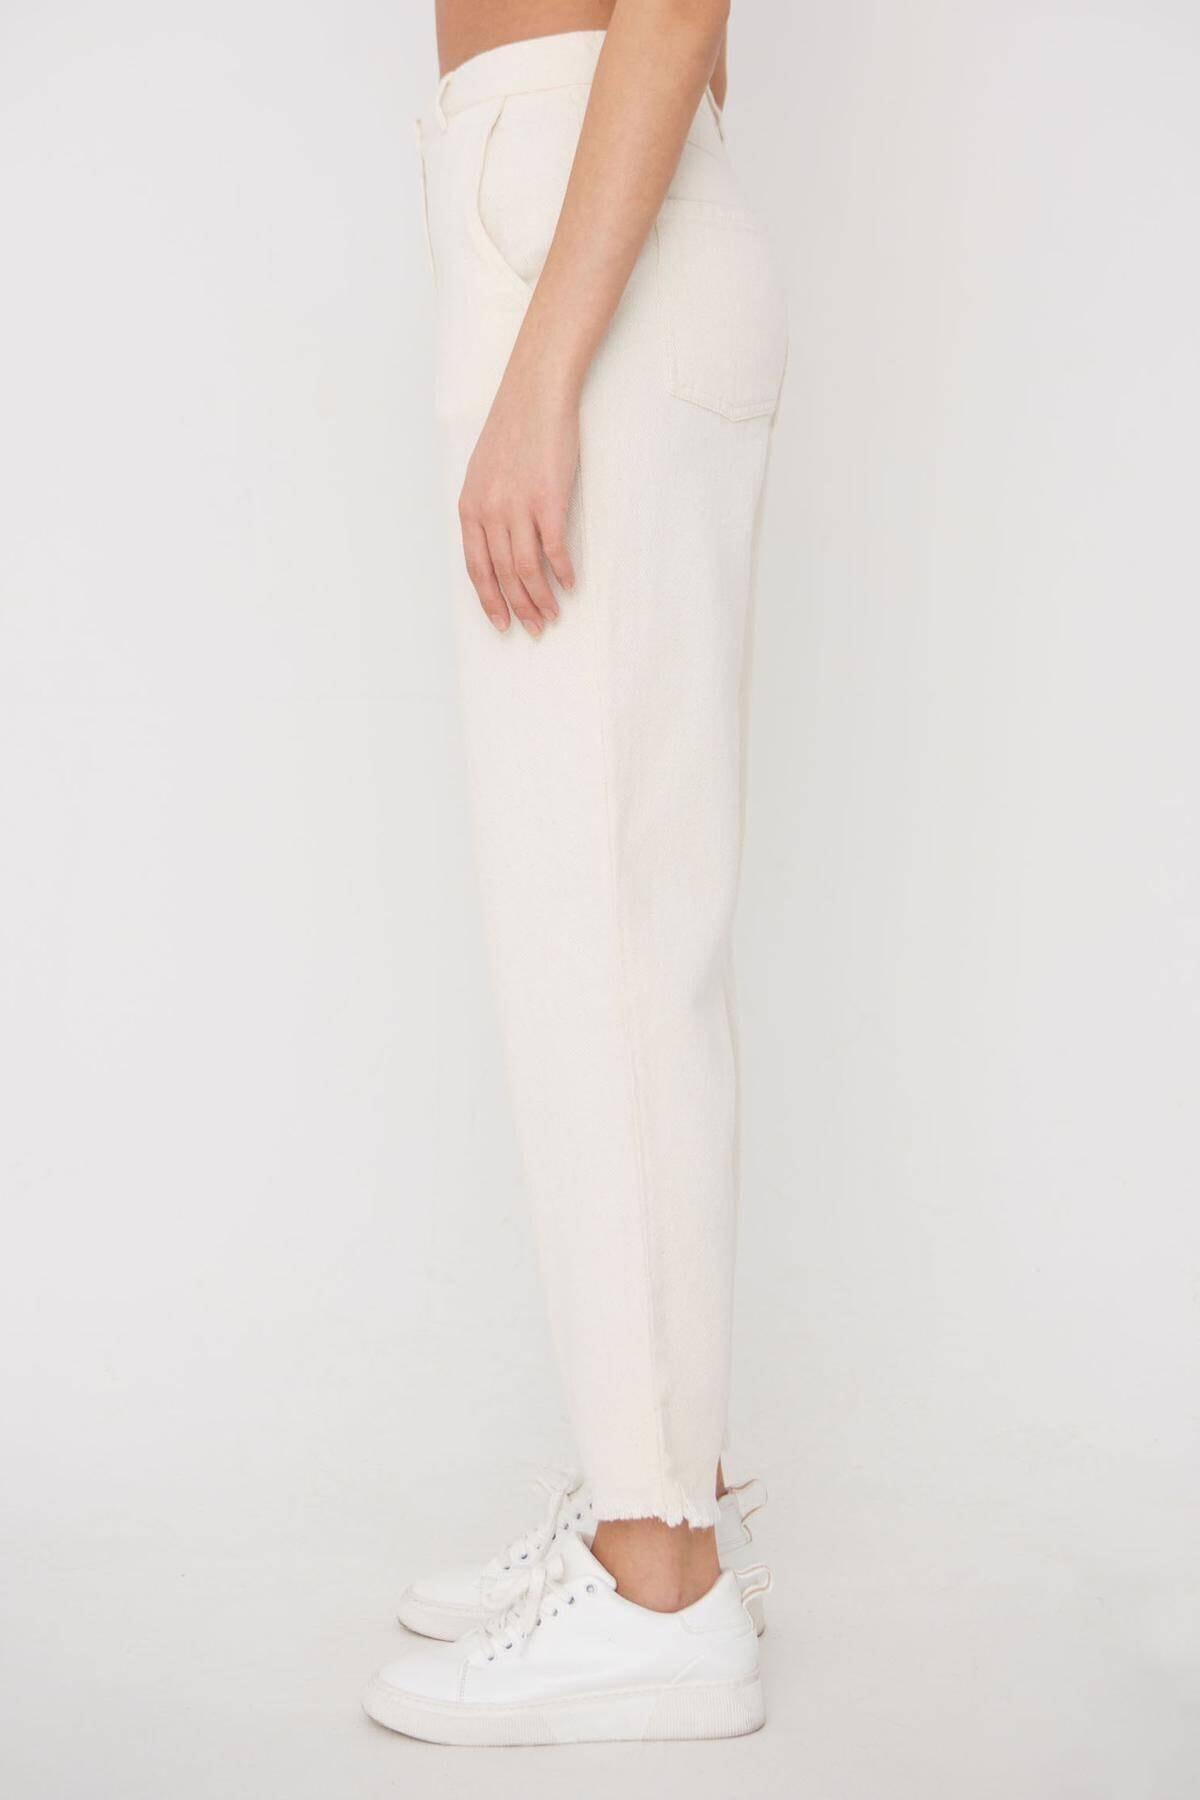 Addax Kadın Ham Paça Detaylı Pantolon Pn11-0049 - K8 Adx-0000023876 3